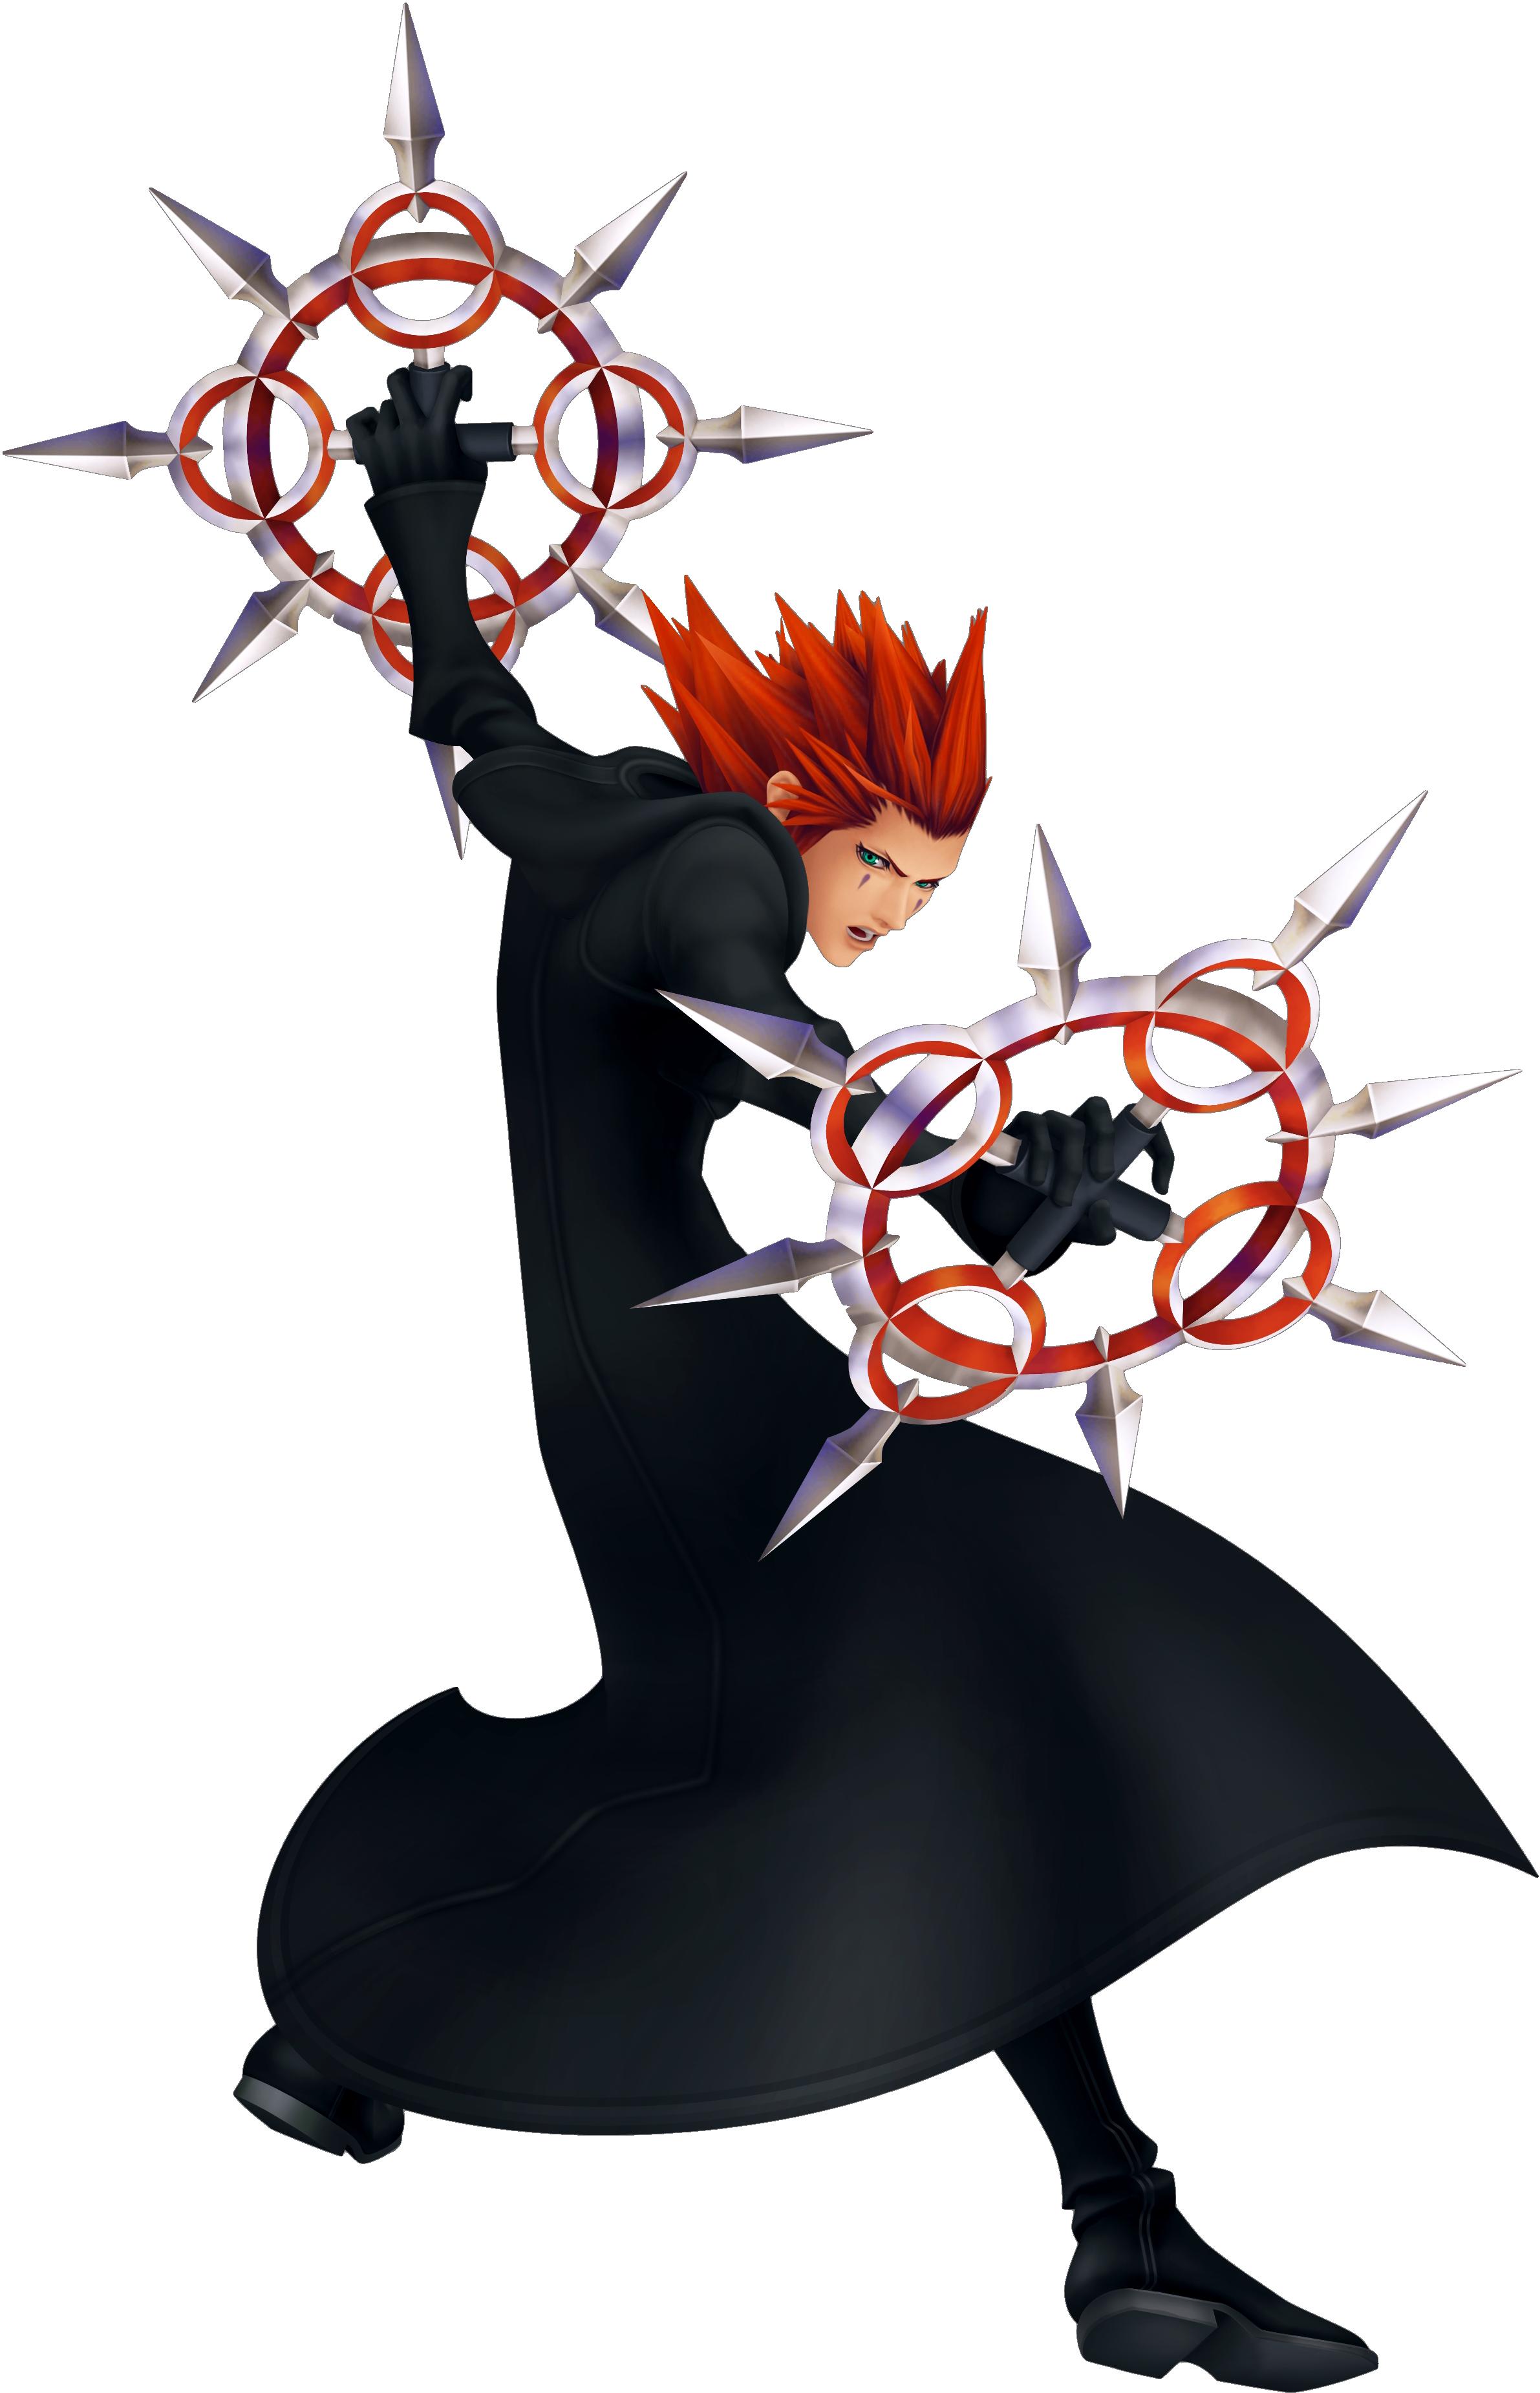 Axel/Gameplay